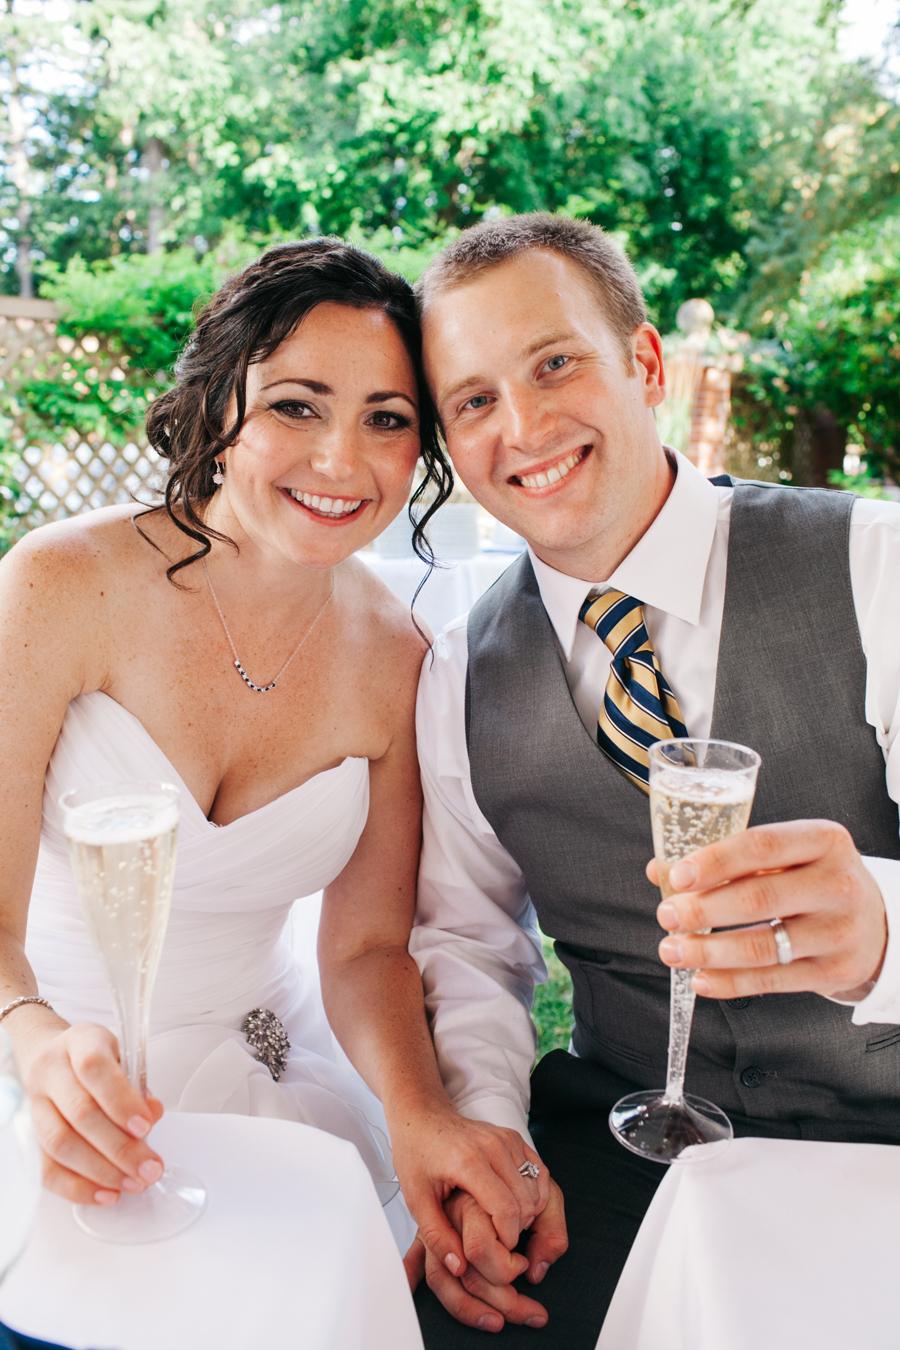 087-lairmont-manor-bellingham-washington-wedding-katheryn-moran-photography.jpg